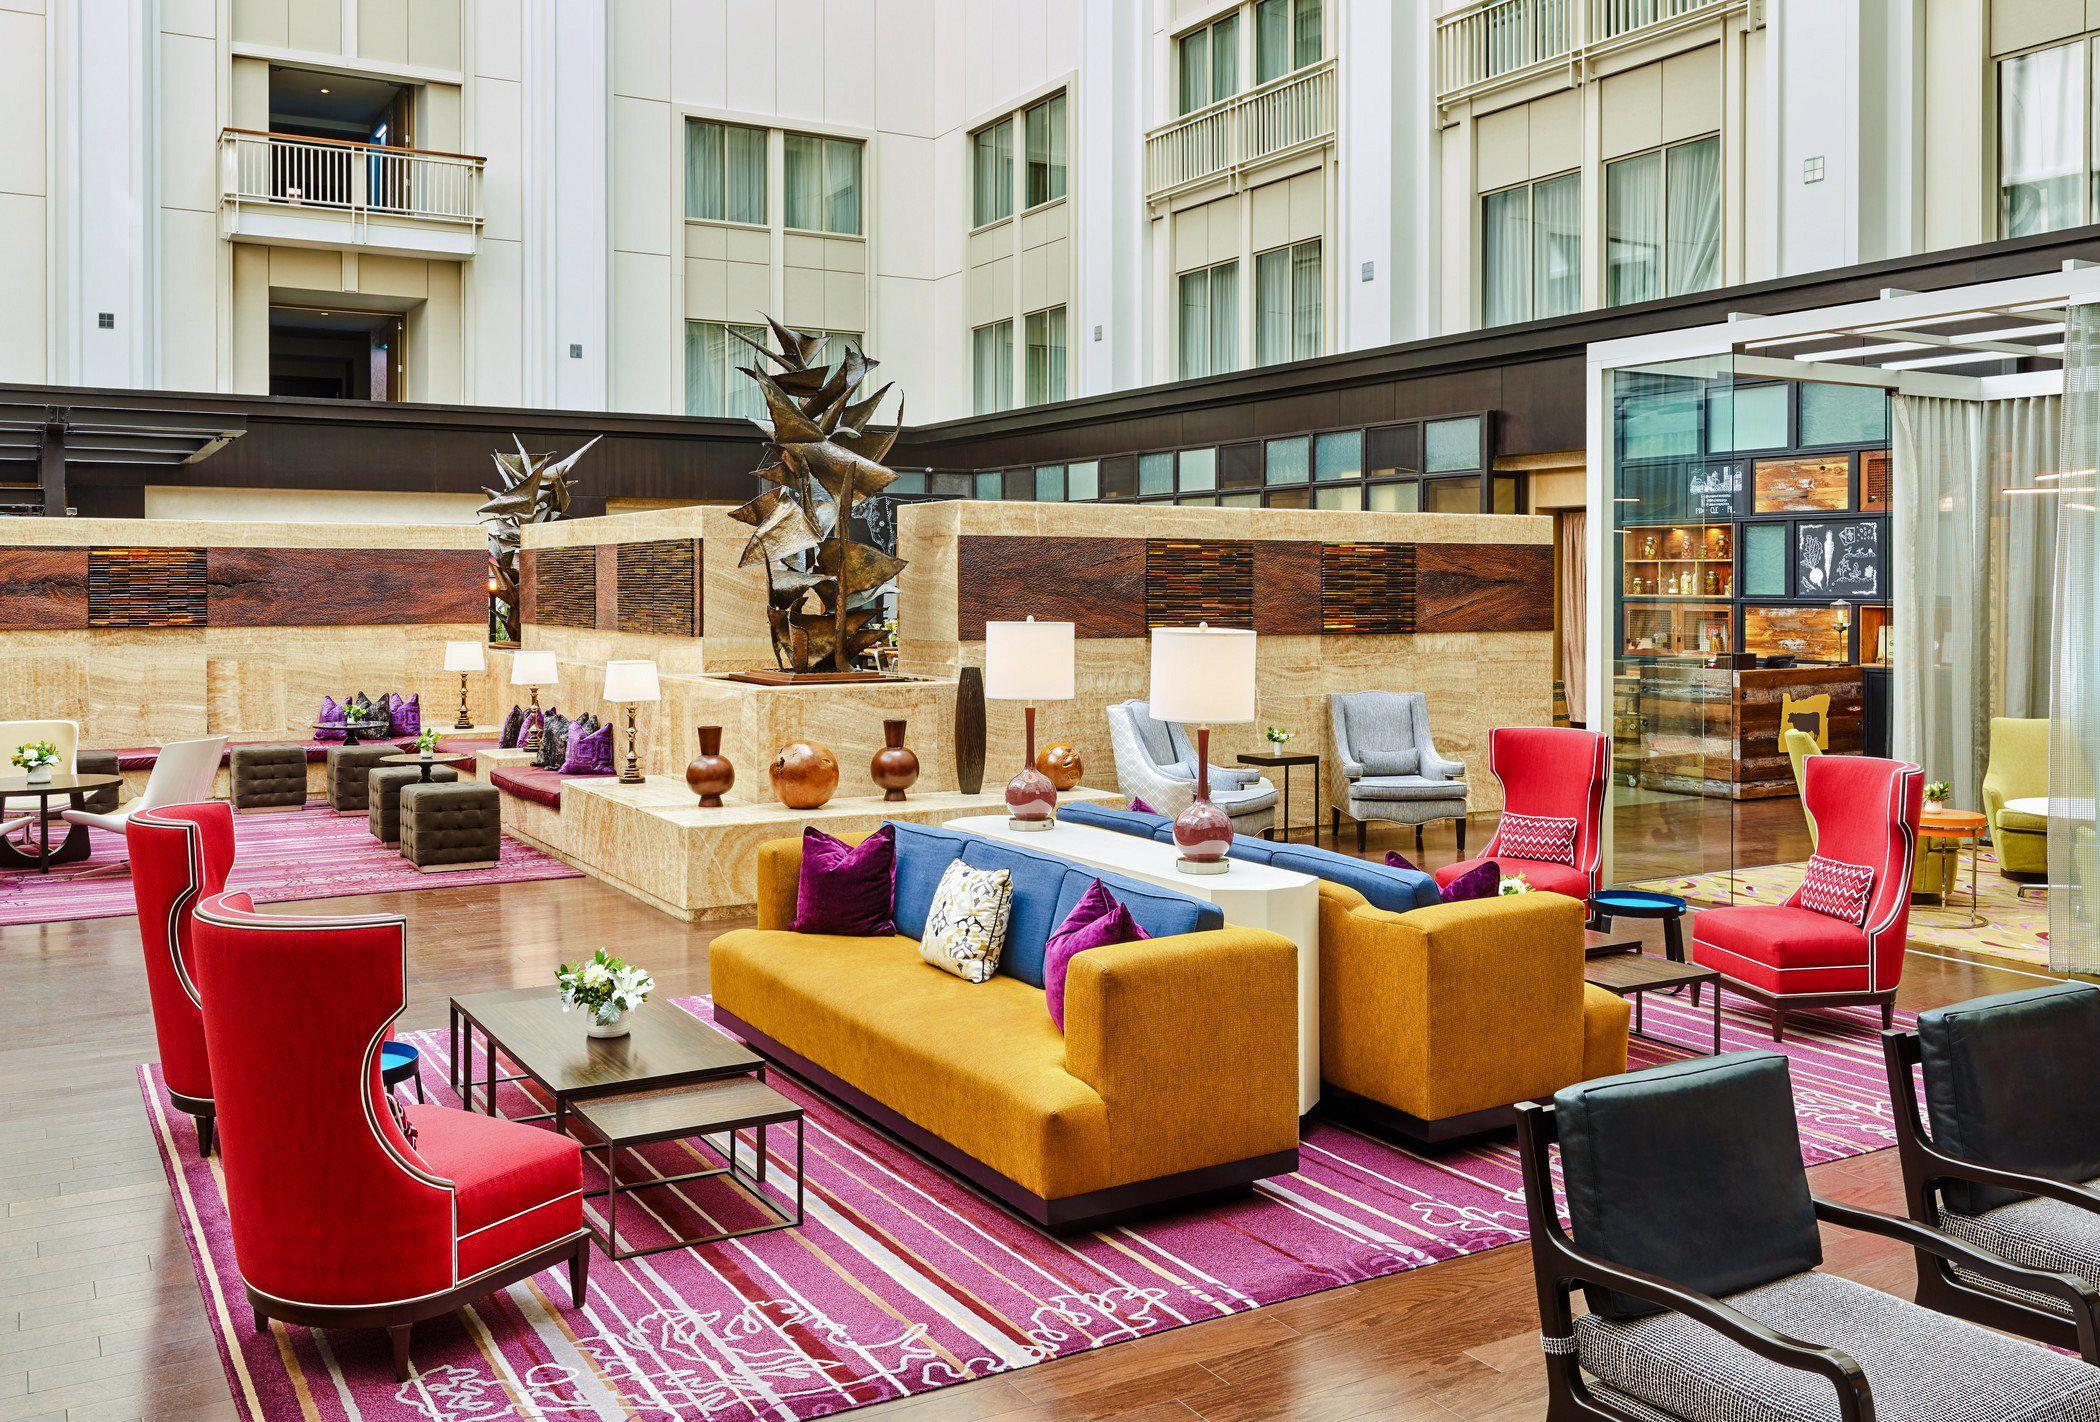 Boutique Hotels Food + Drink Hotels Luxury Travel Style + Design Trip Ideas Weekend Getaways building living room interior design furniture Lobby loft